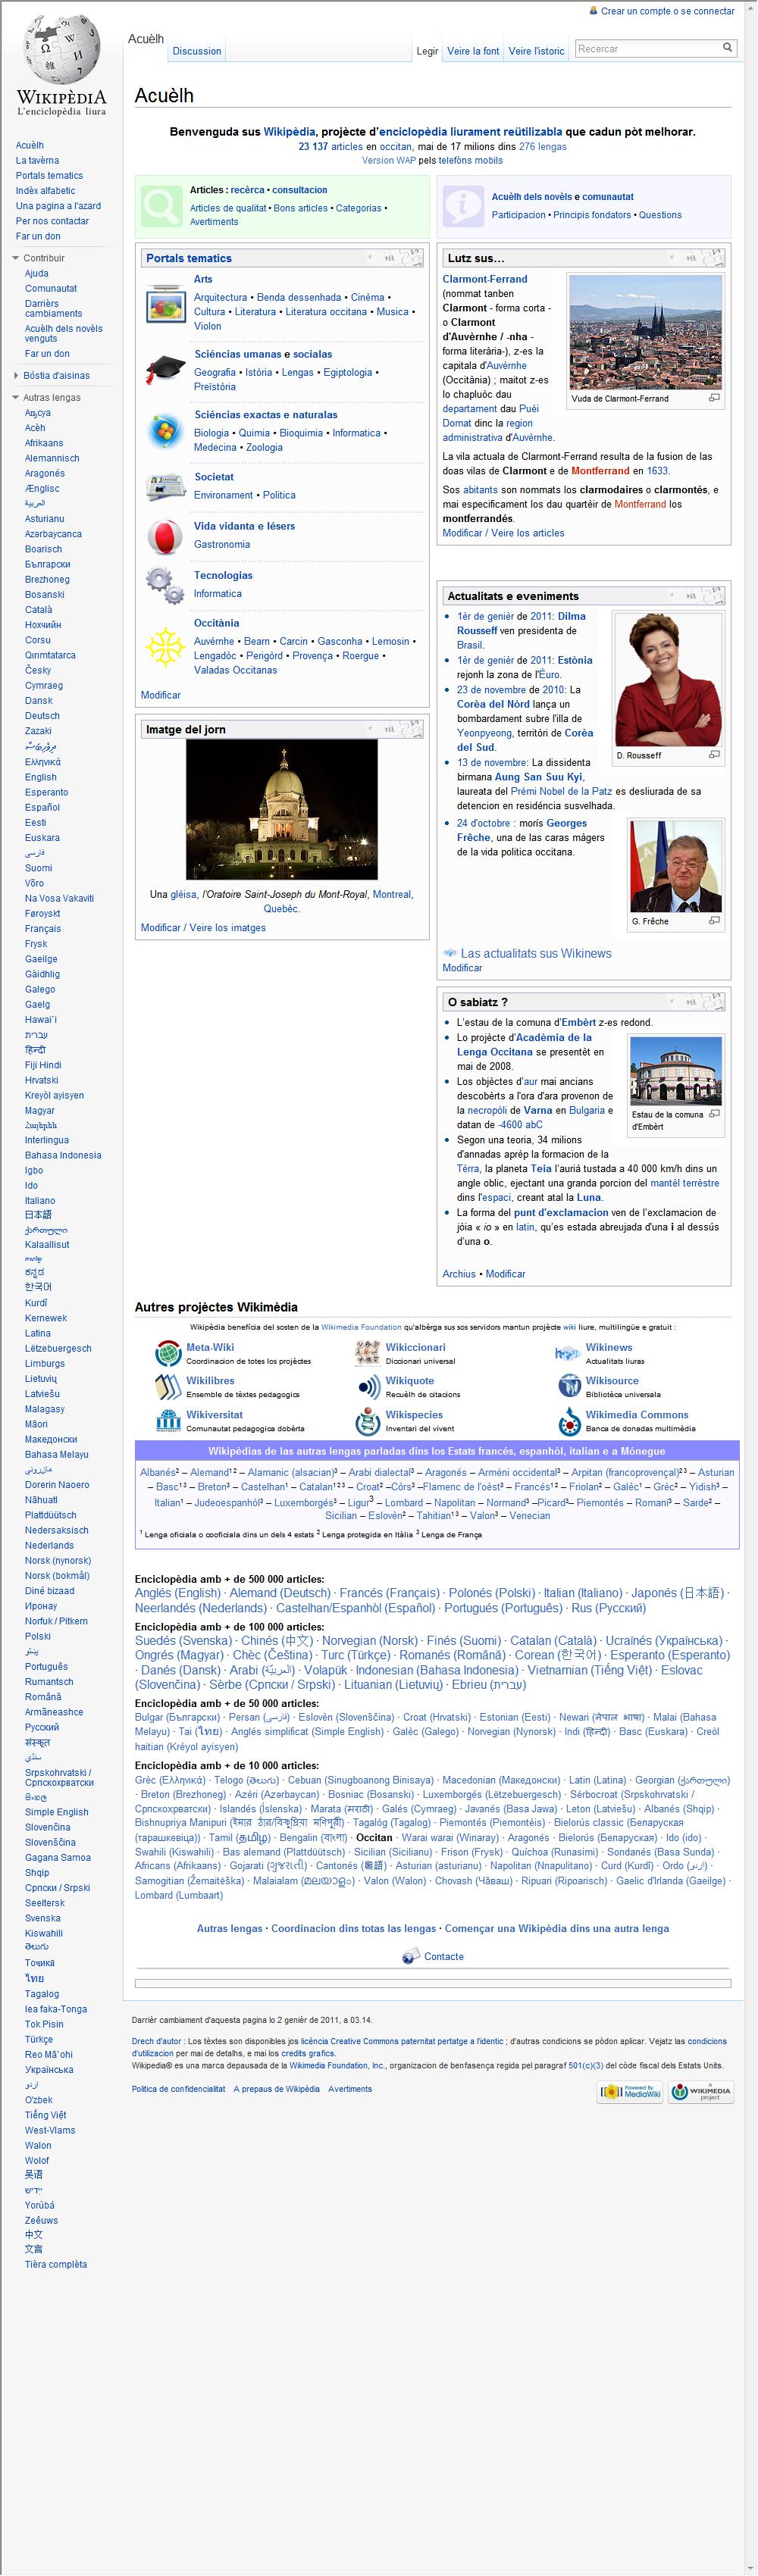 Wikipedia Main Page Gallery Screen Shots Taken Saturday January 1